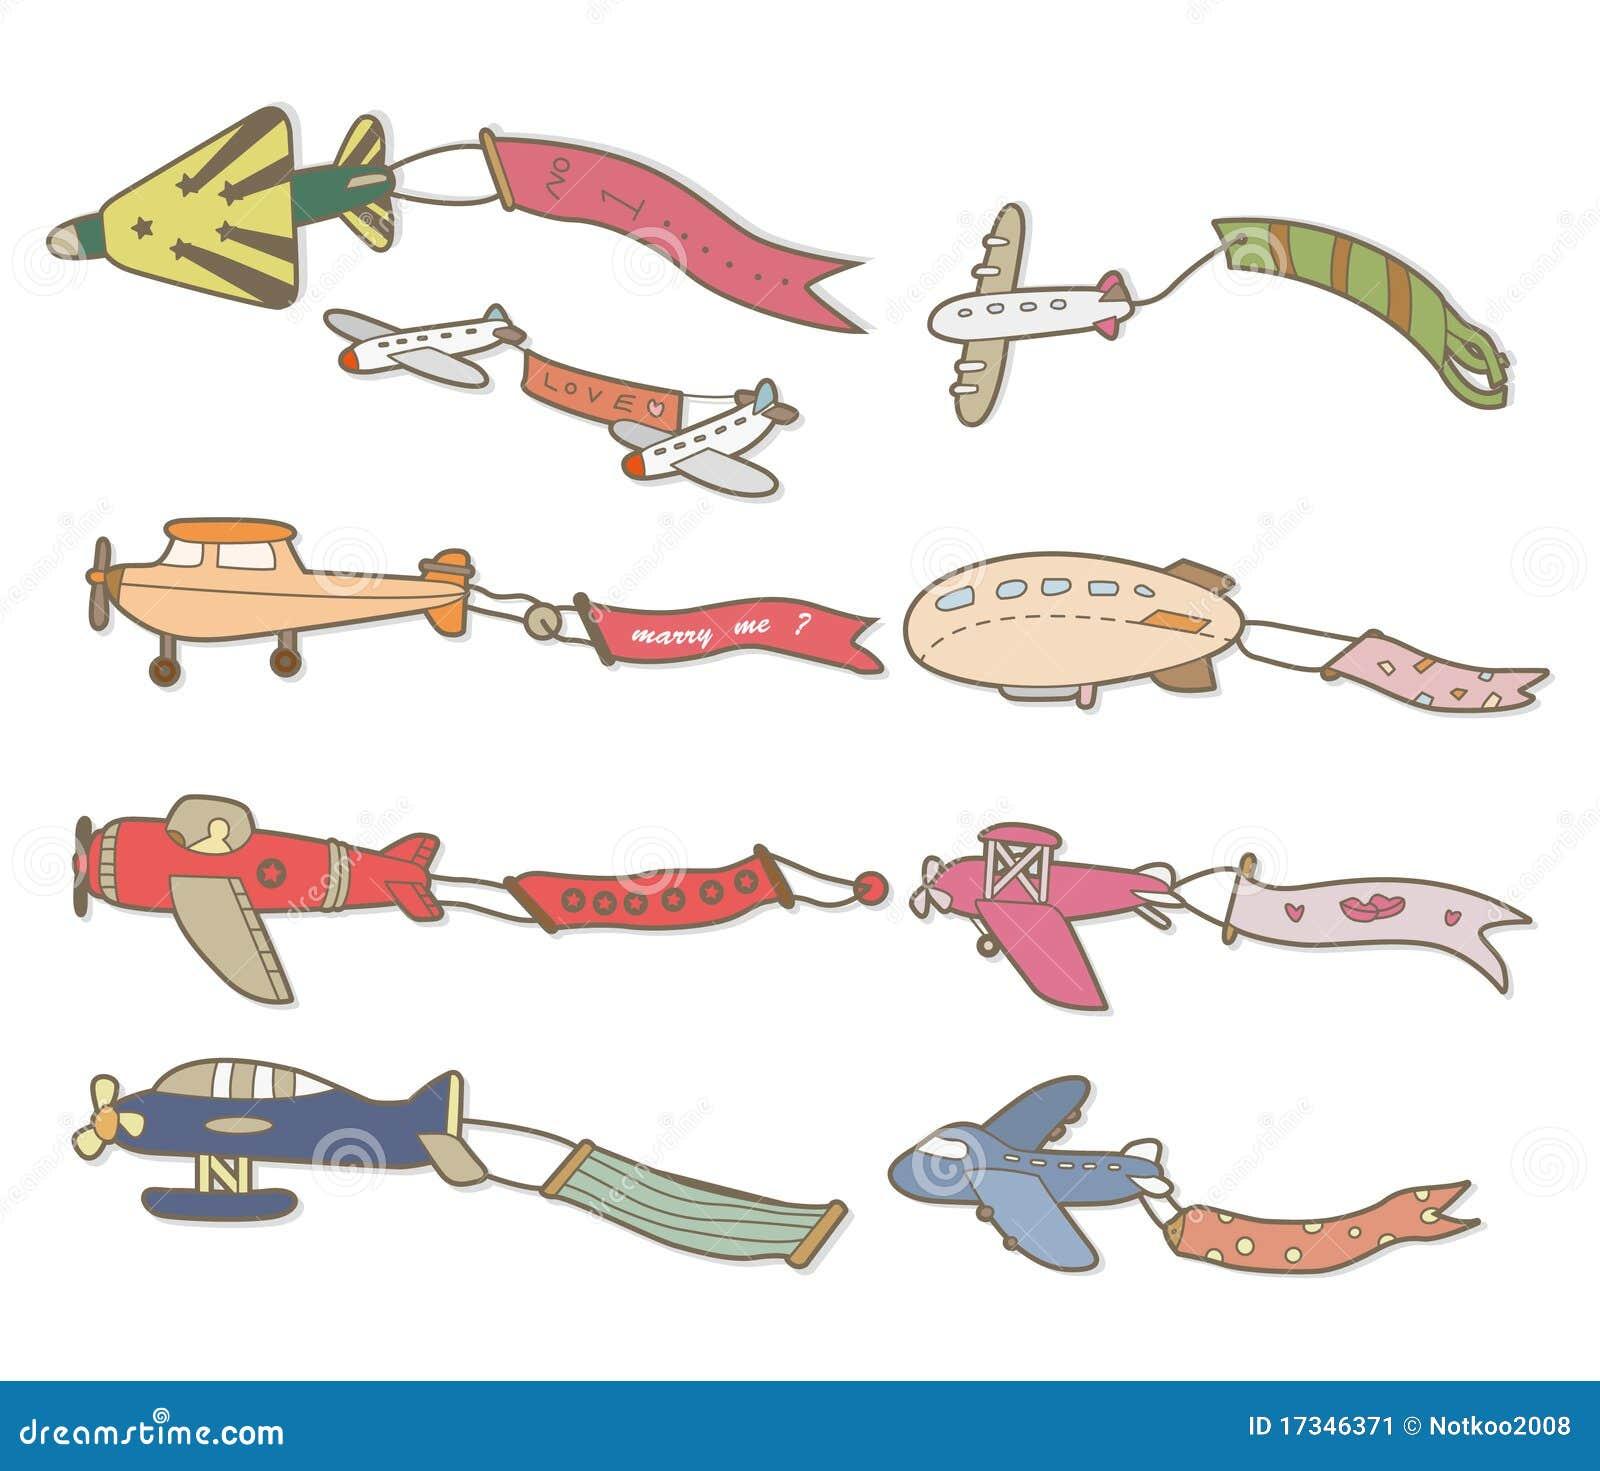 Banderole publicitaire d 39 avion de dessin anim image stock - Dessin banderole ...